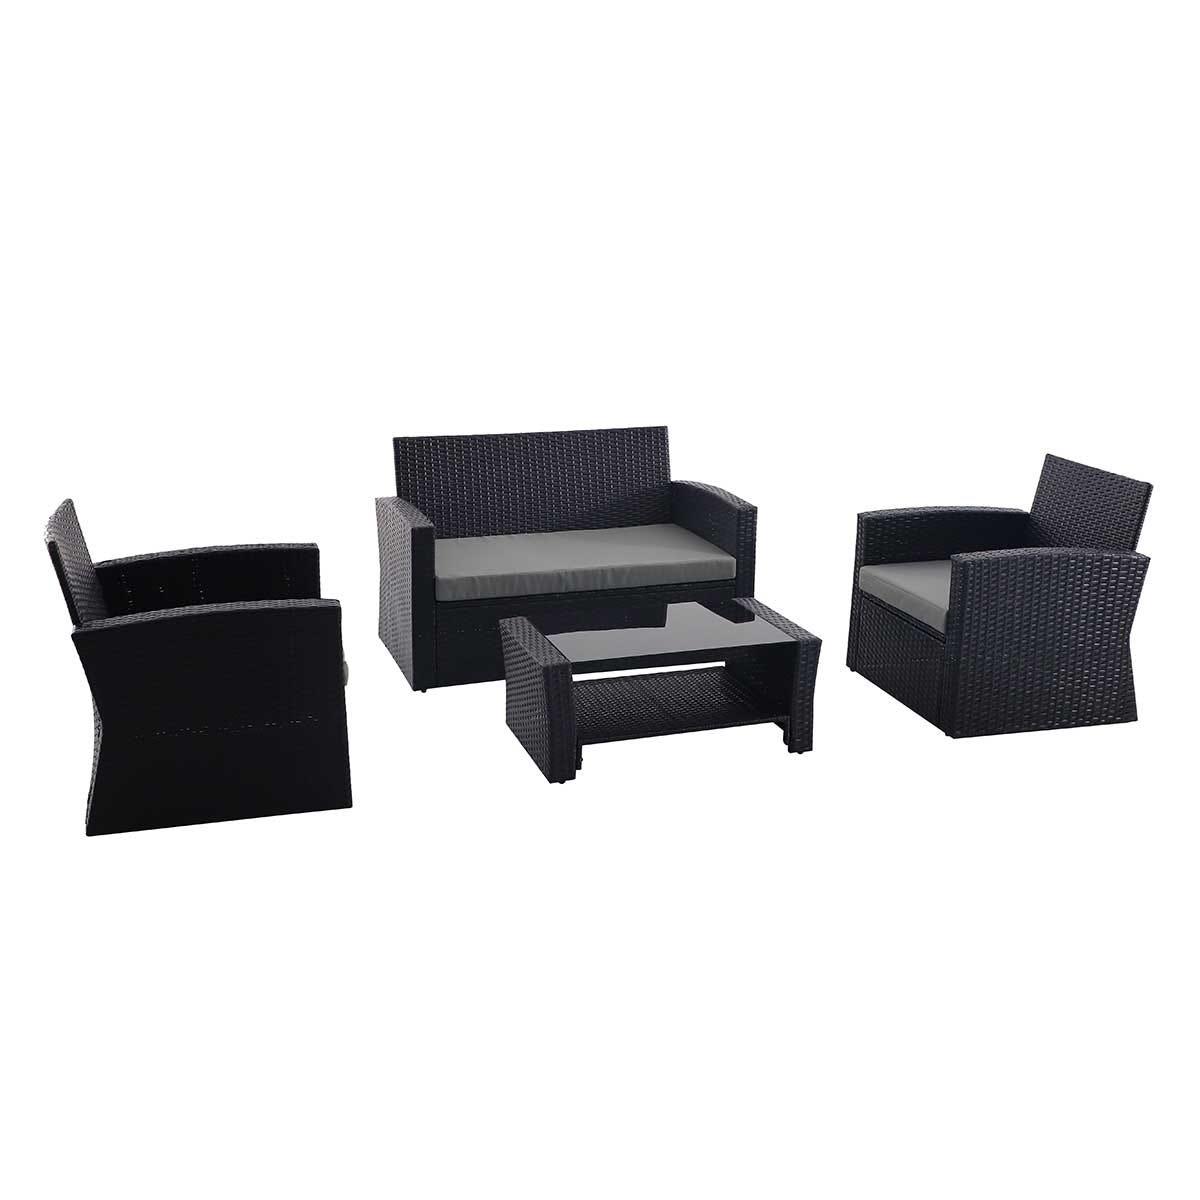 Creador 4 Seater Rattan Sofa Set - Black/Grey